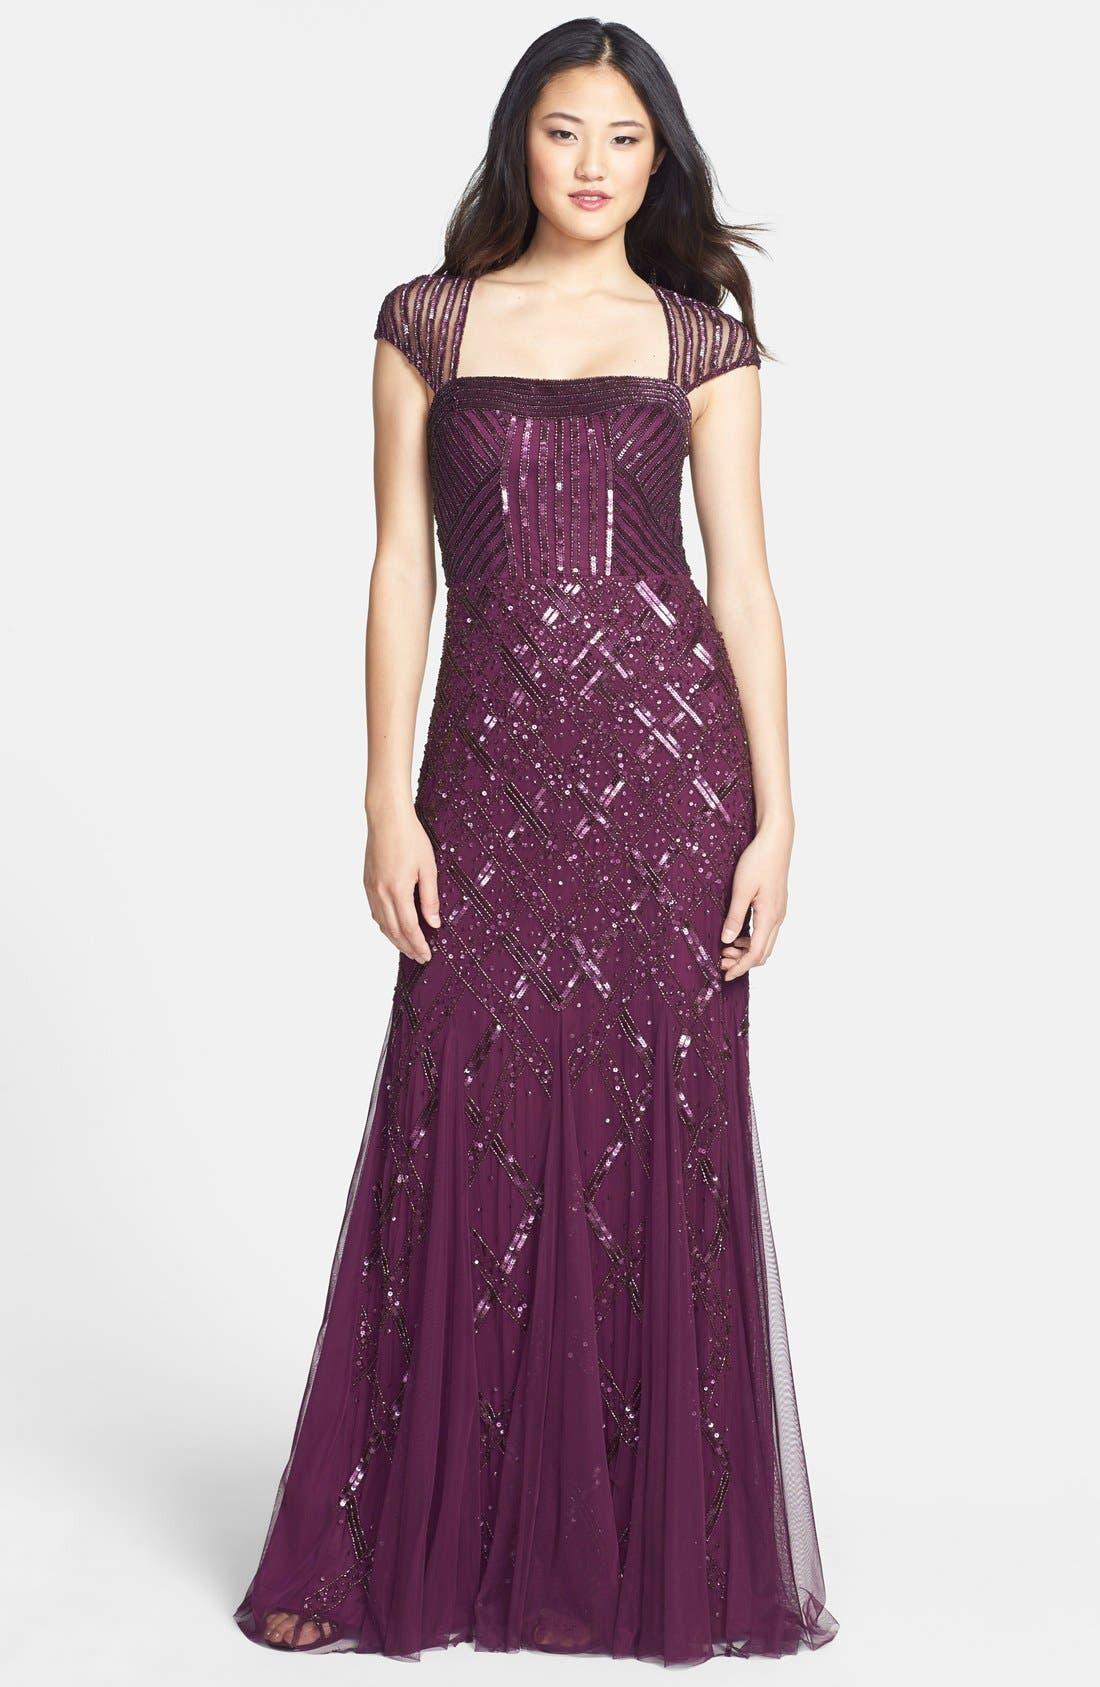 Alternate Image 1 Selected - Adrianna Papell Embellished Mesh Mermaid Gown (Regular & Petite)